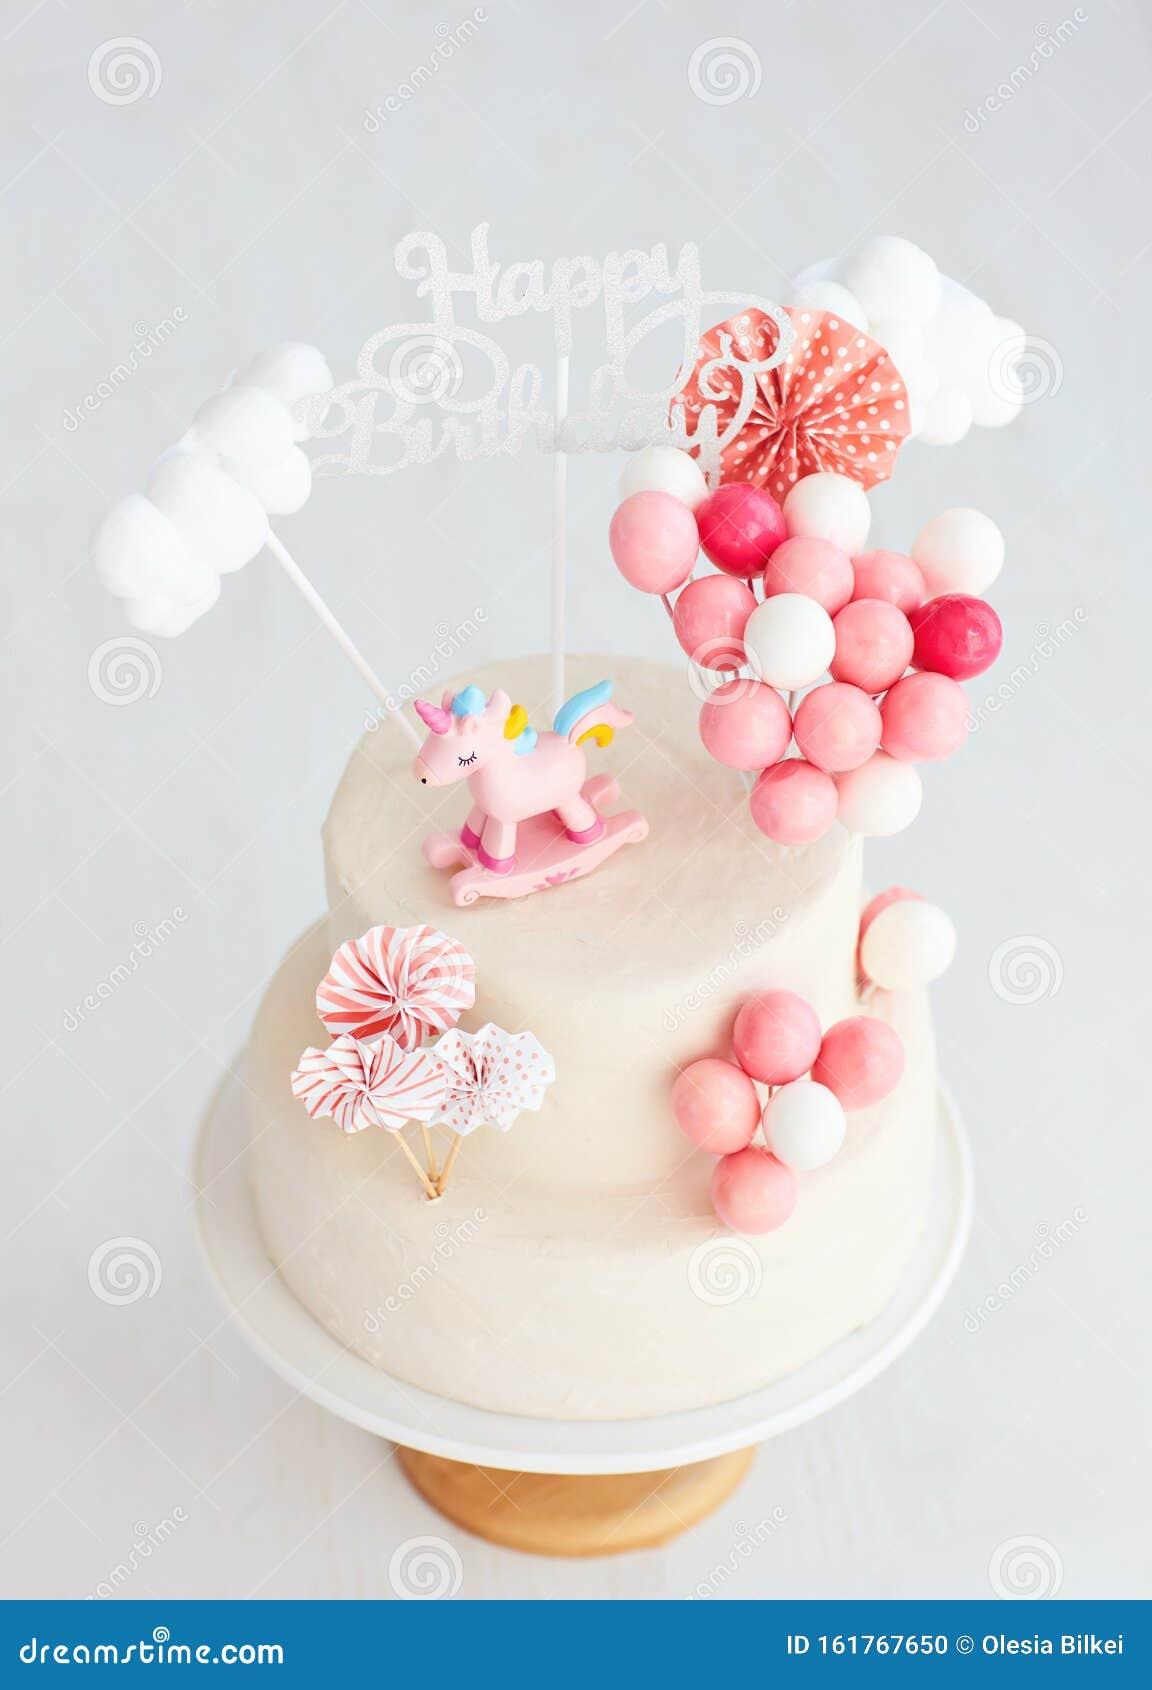 Tremendous Baby Girl Birthday Cake With Unicorn And Balloons Stock Photo Birthday Cards Printable Trancafe Filternl